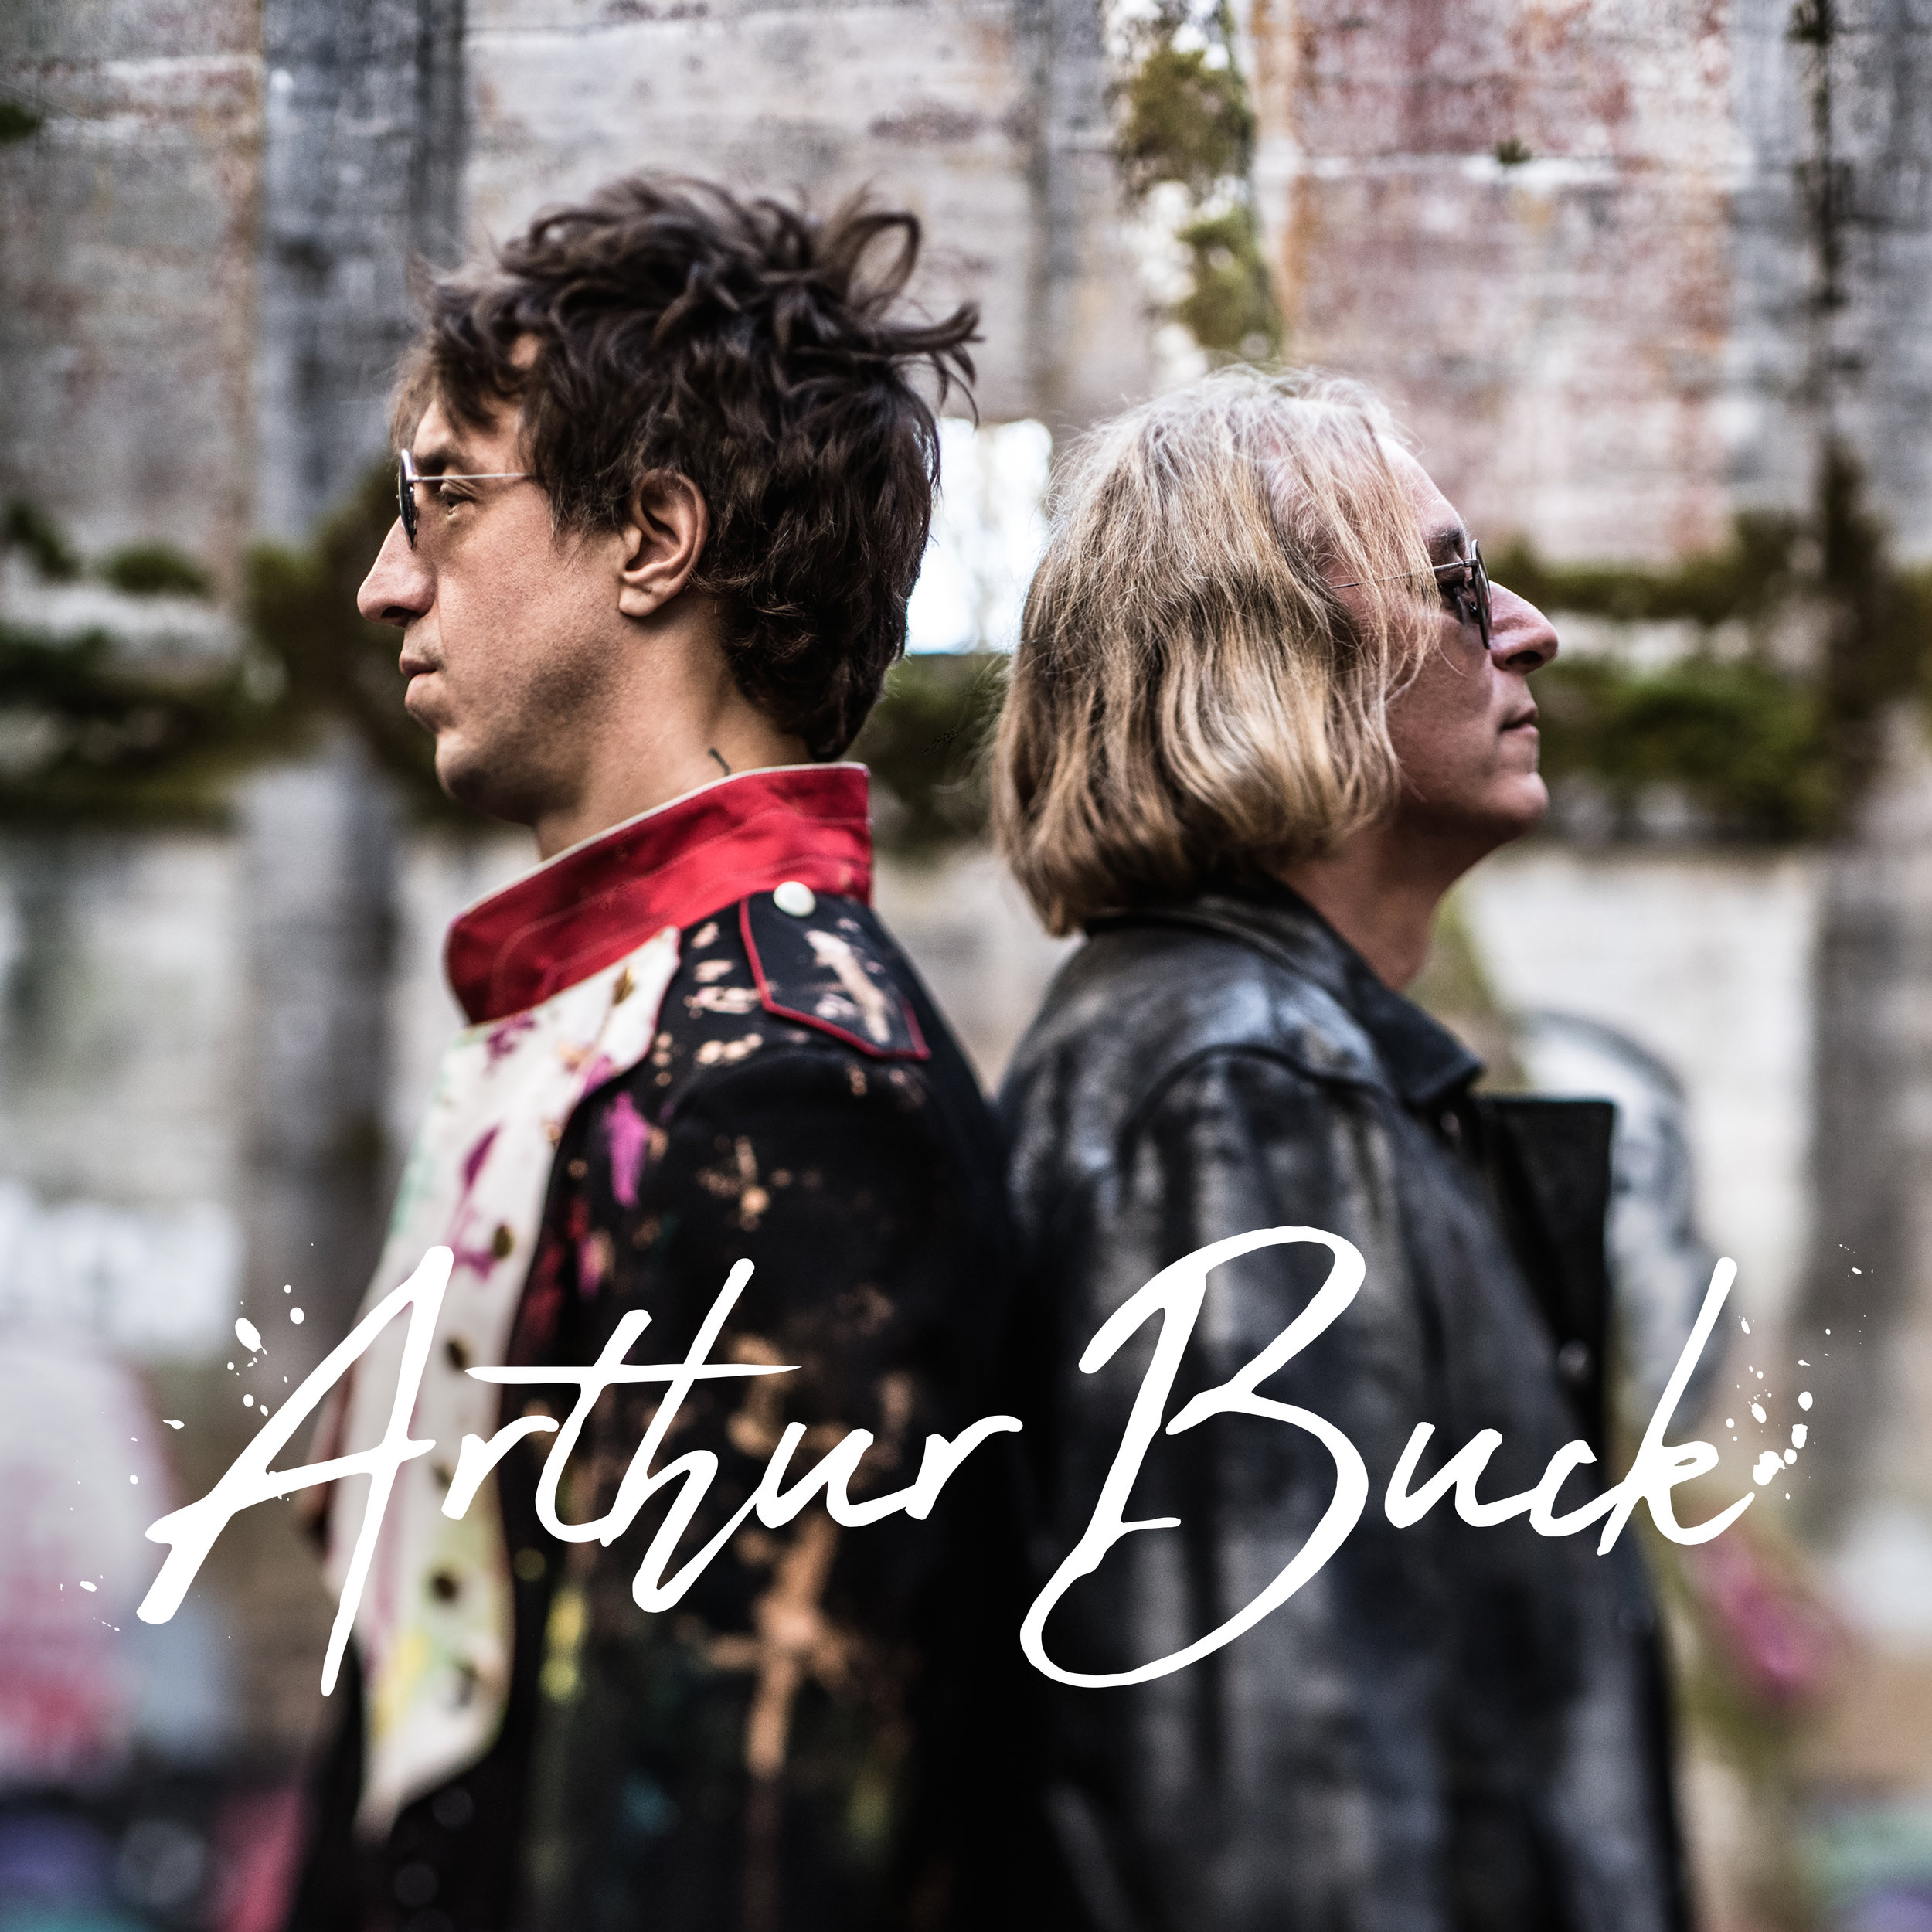 Arthur Buck Album Cover